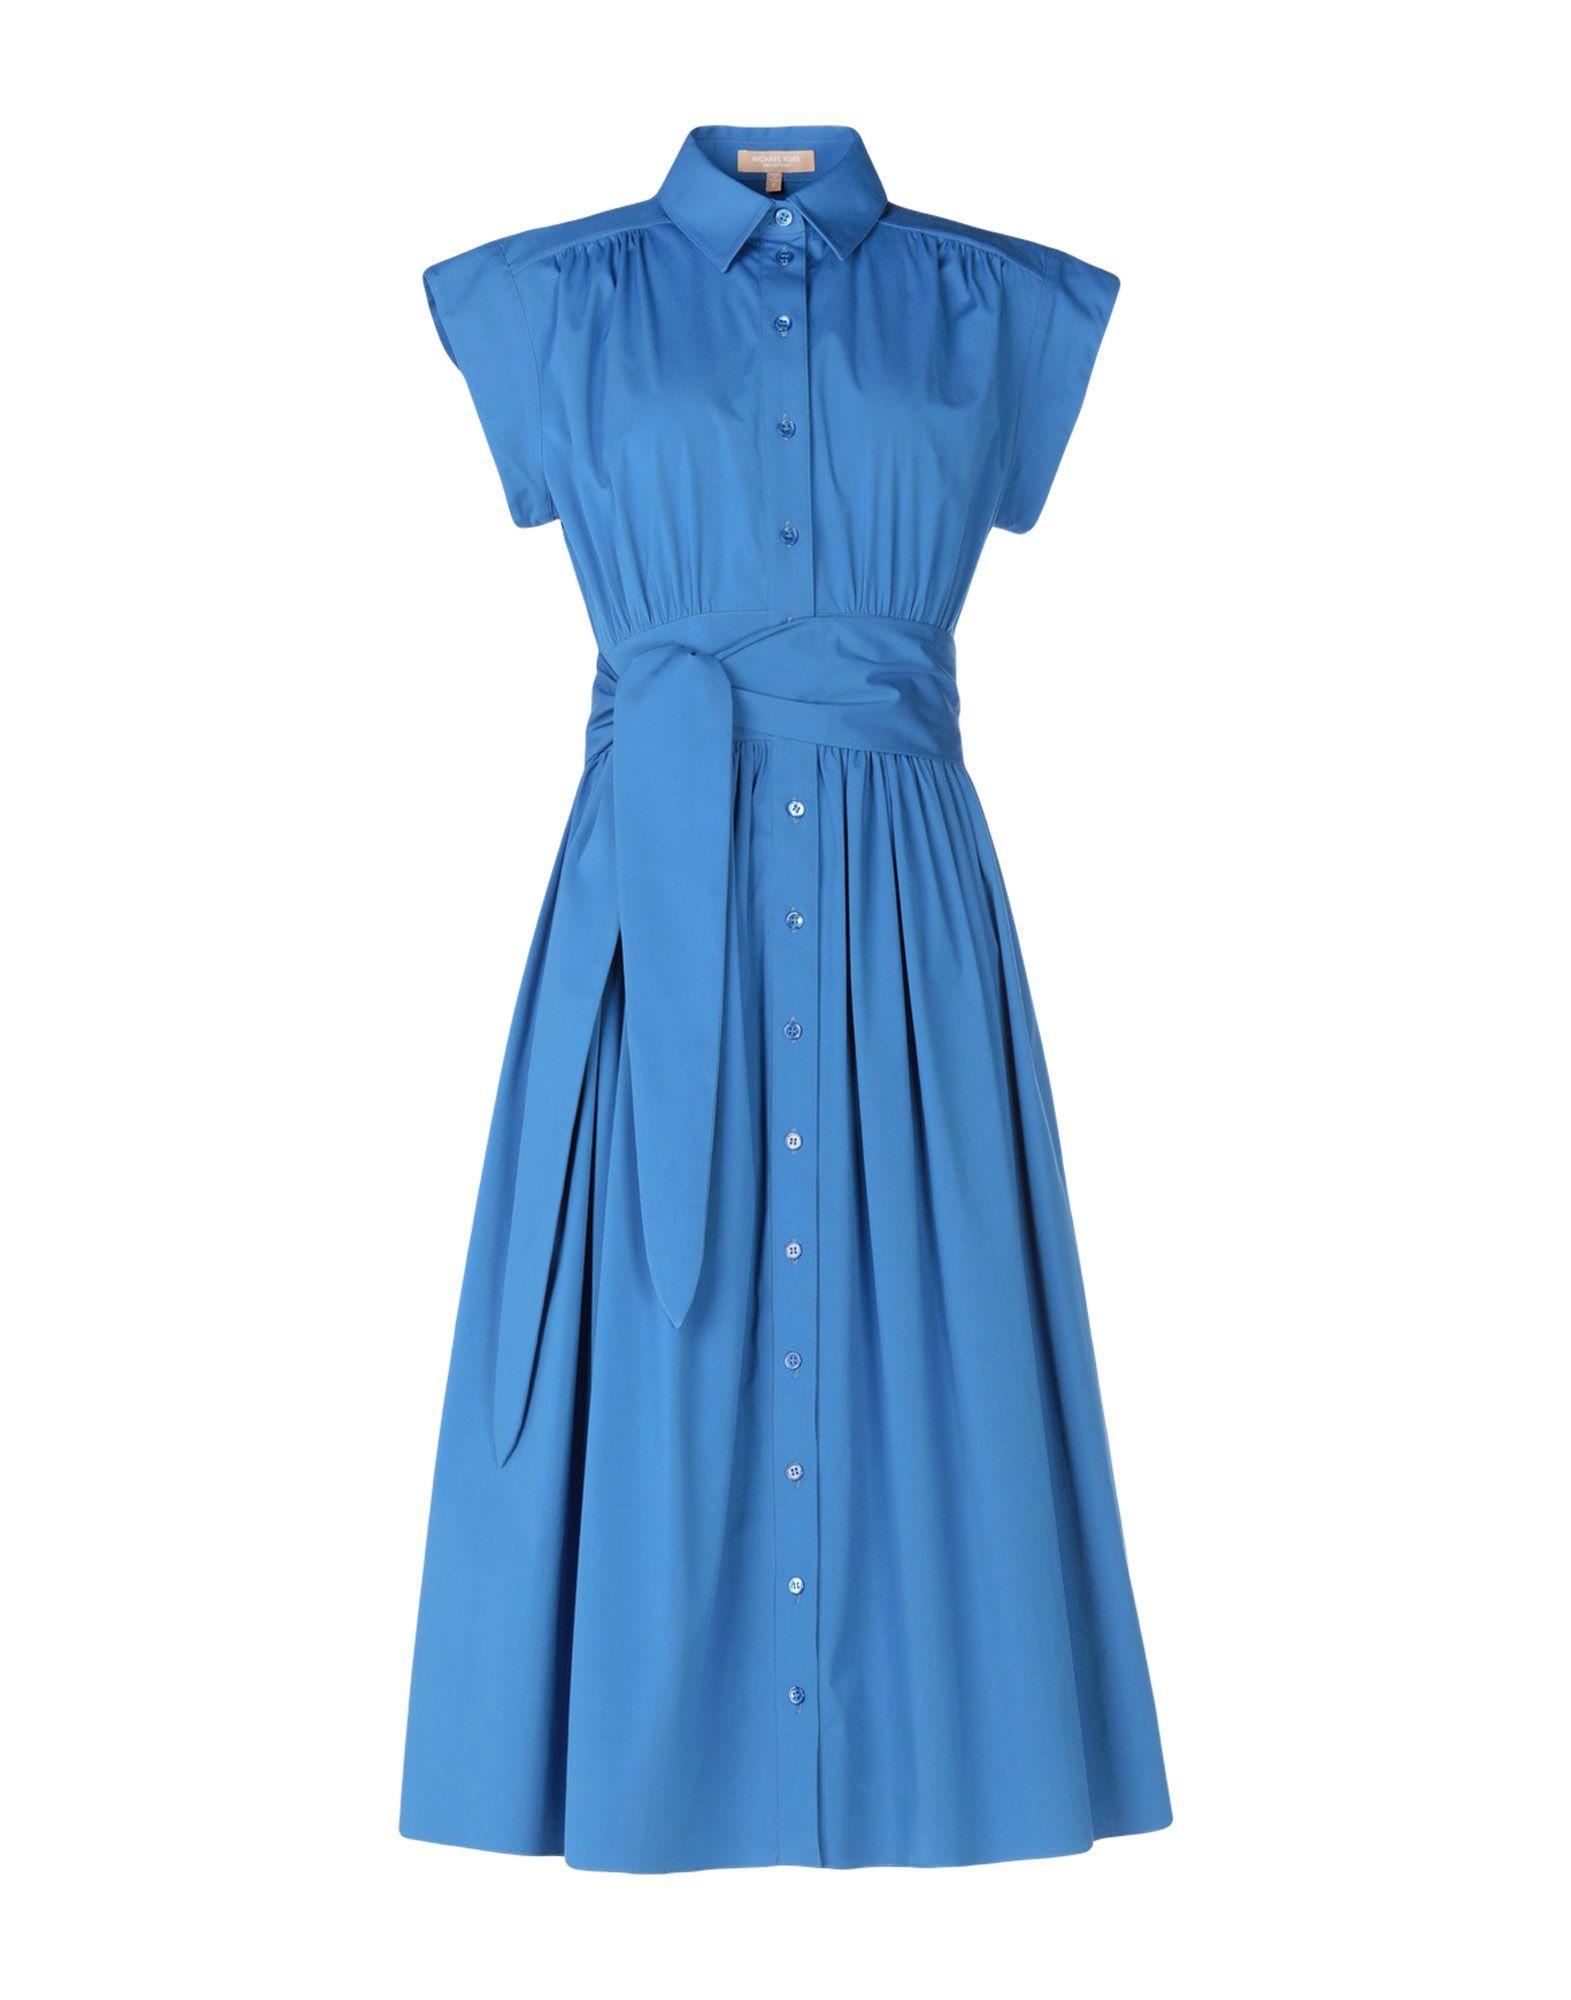 MICHAEL KORS COLLECTION Платье до колена michael kors collection платье до колена